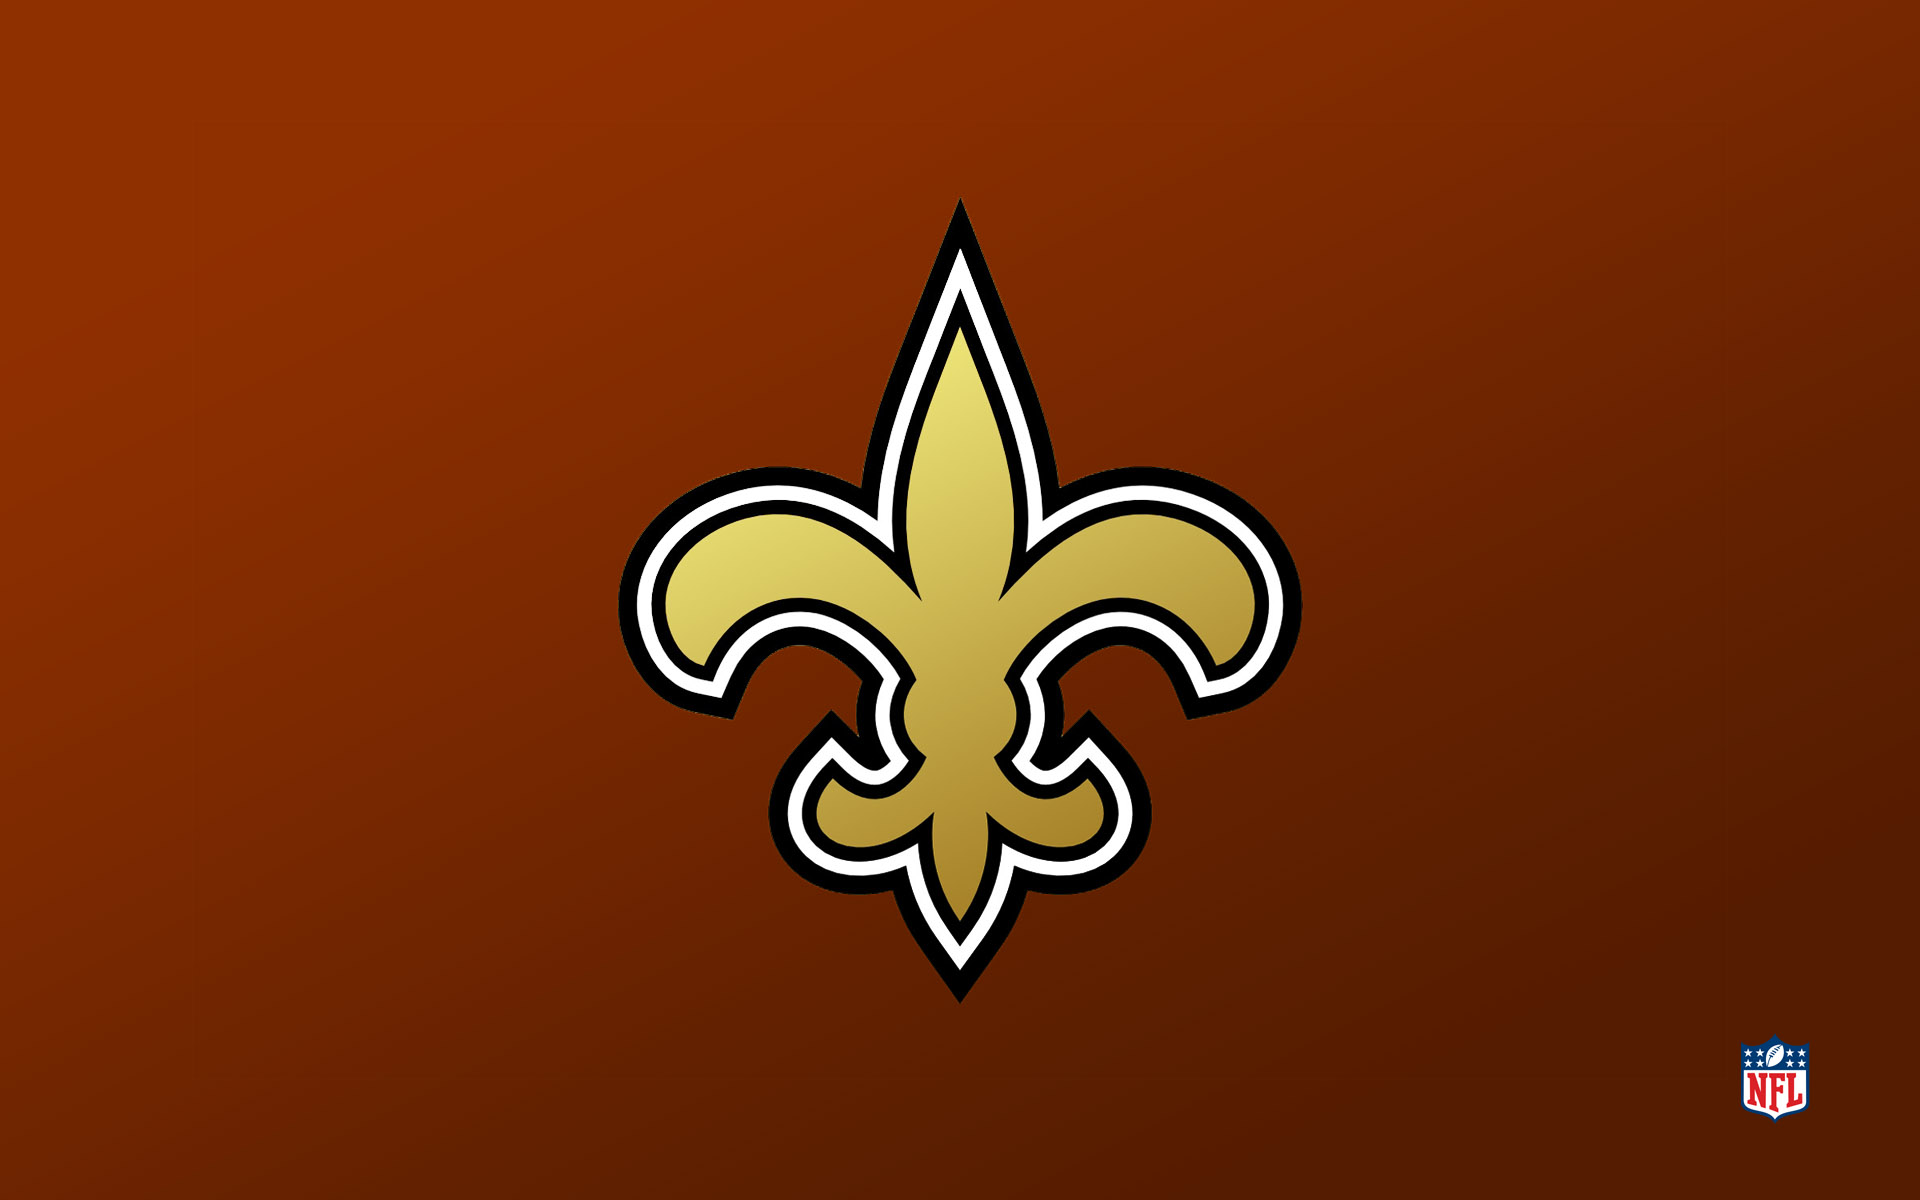 New Orleans Saints 1920x1200 WIDE Image Sports NFL Football 1920x1200